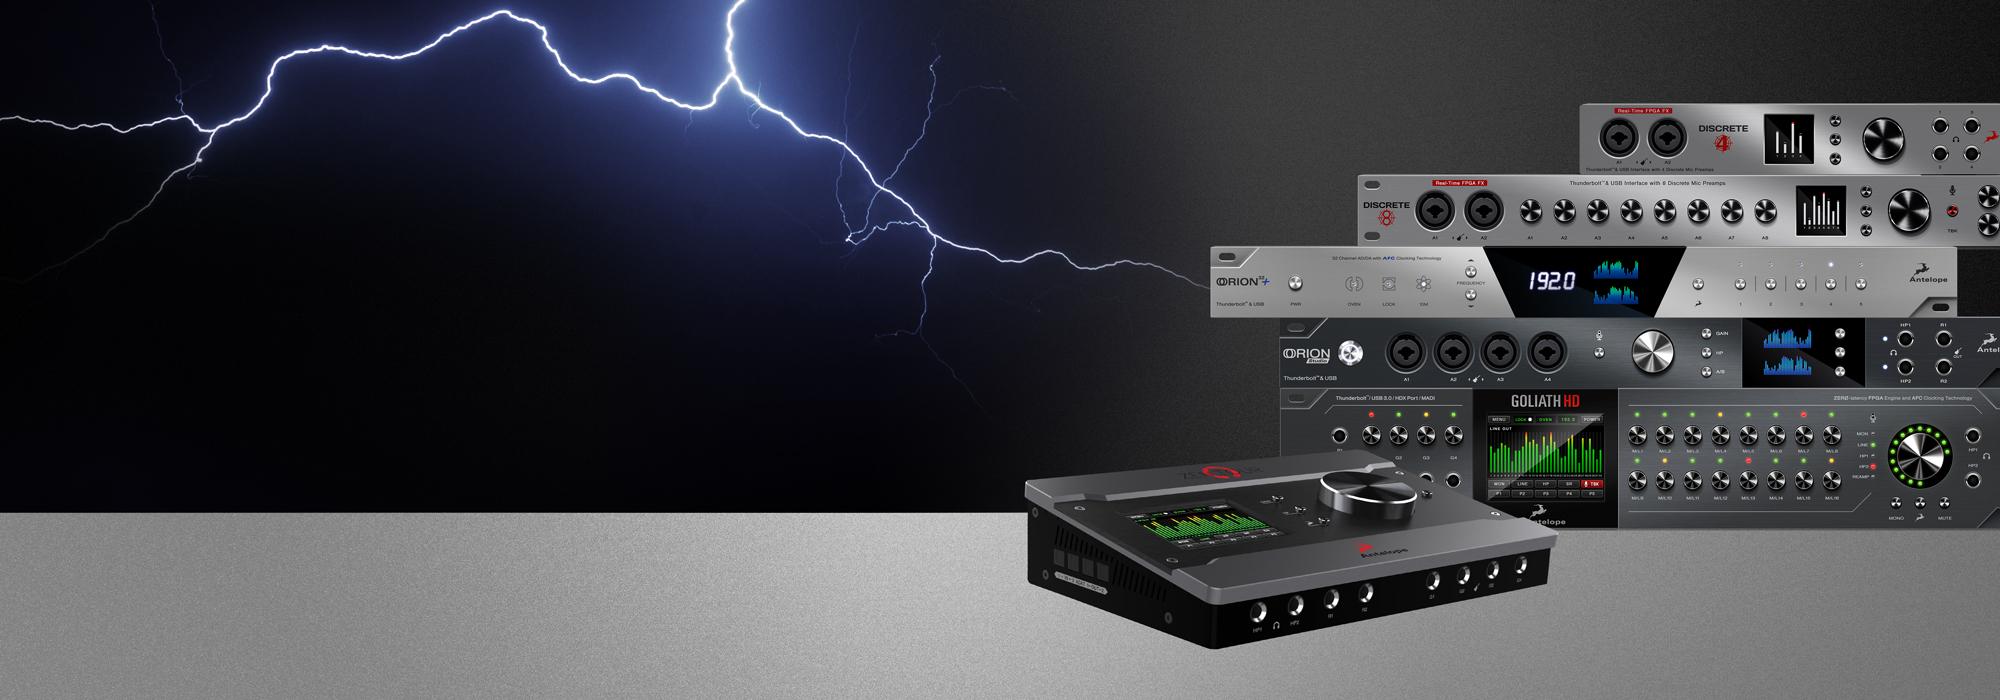 Antelope Audio Announce Windows Thunderbolt driver as part of the company's Open Beta program